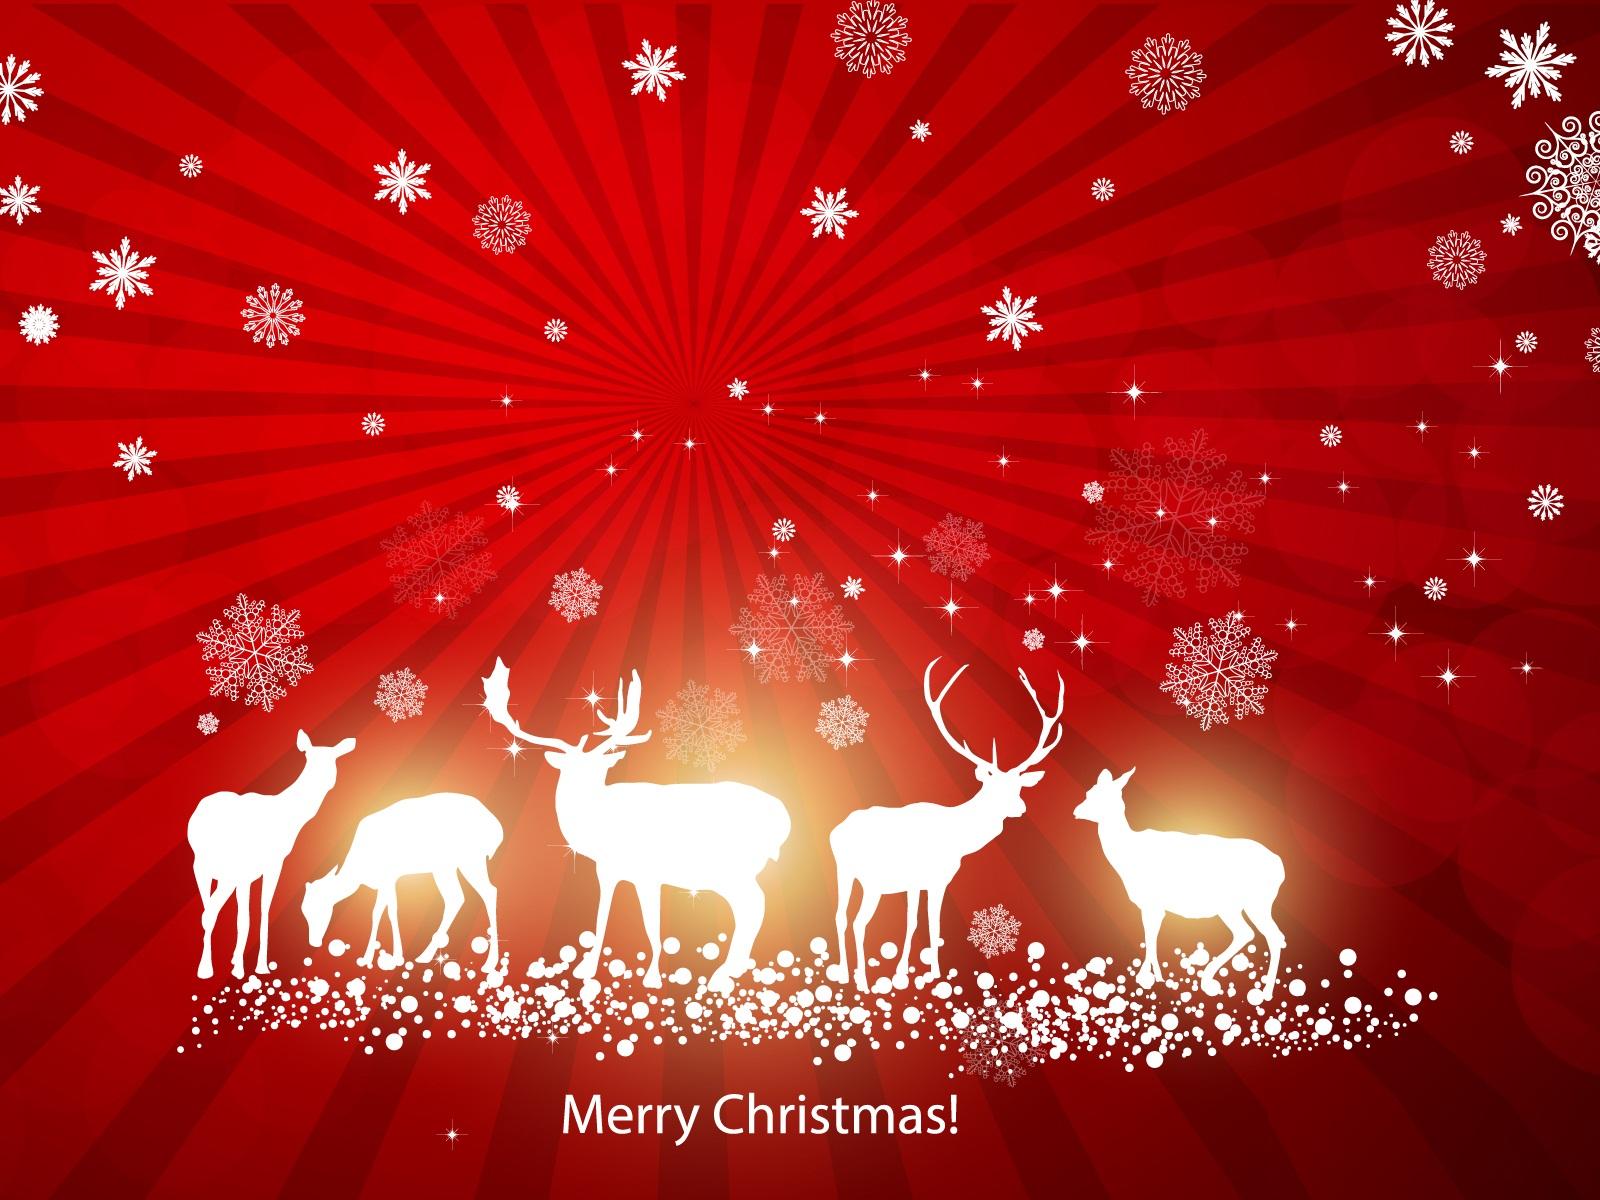 free christmas wallpaper and screensavers 2015   Grasscloth Wallpaper 1600x1200